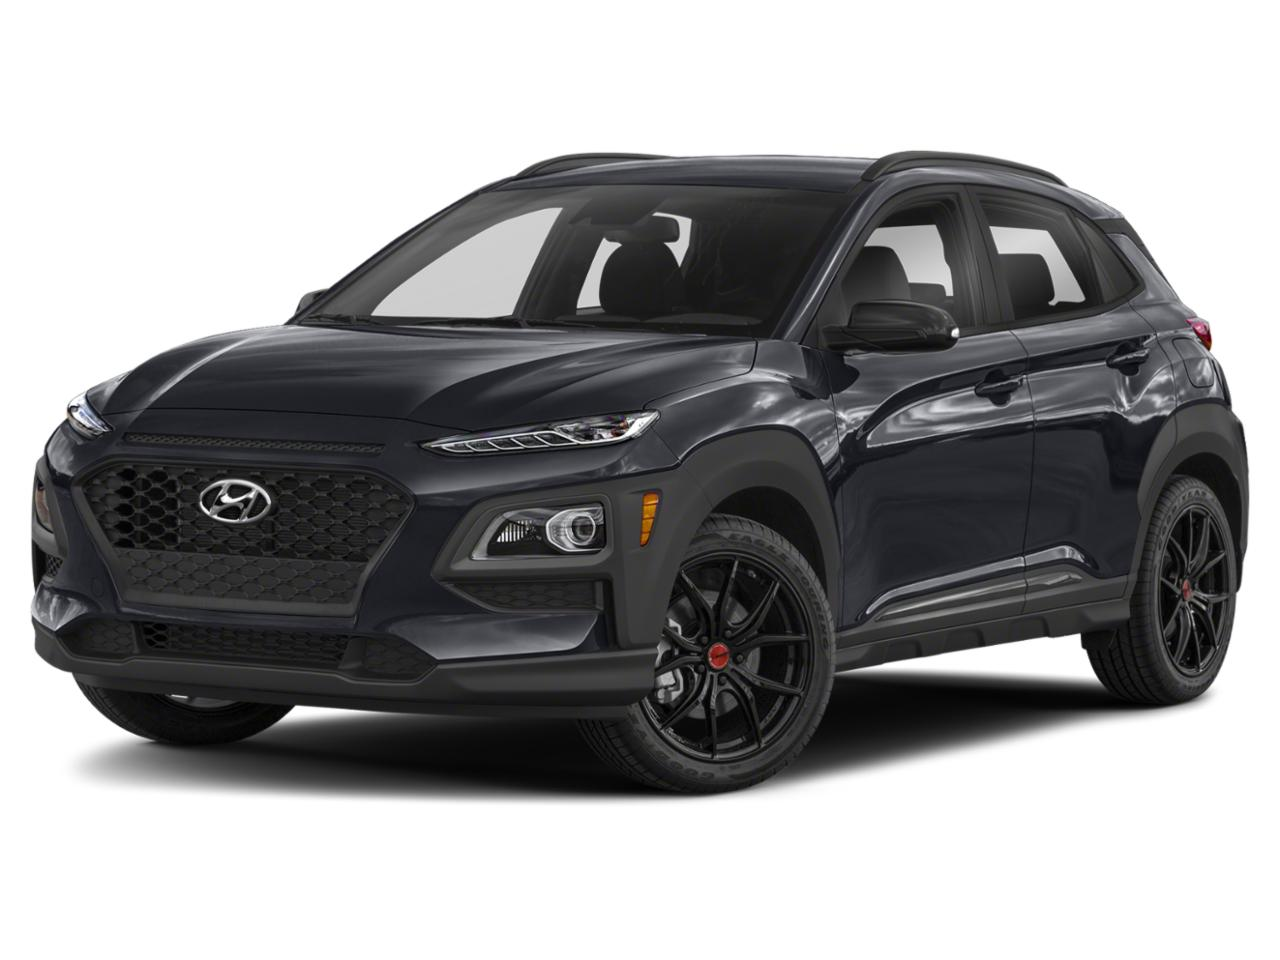 2021 Hyundai Kona Vehicle Photo in O'Fallon, IL 62269